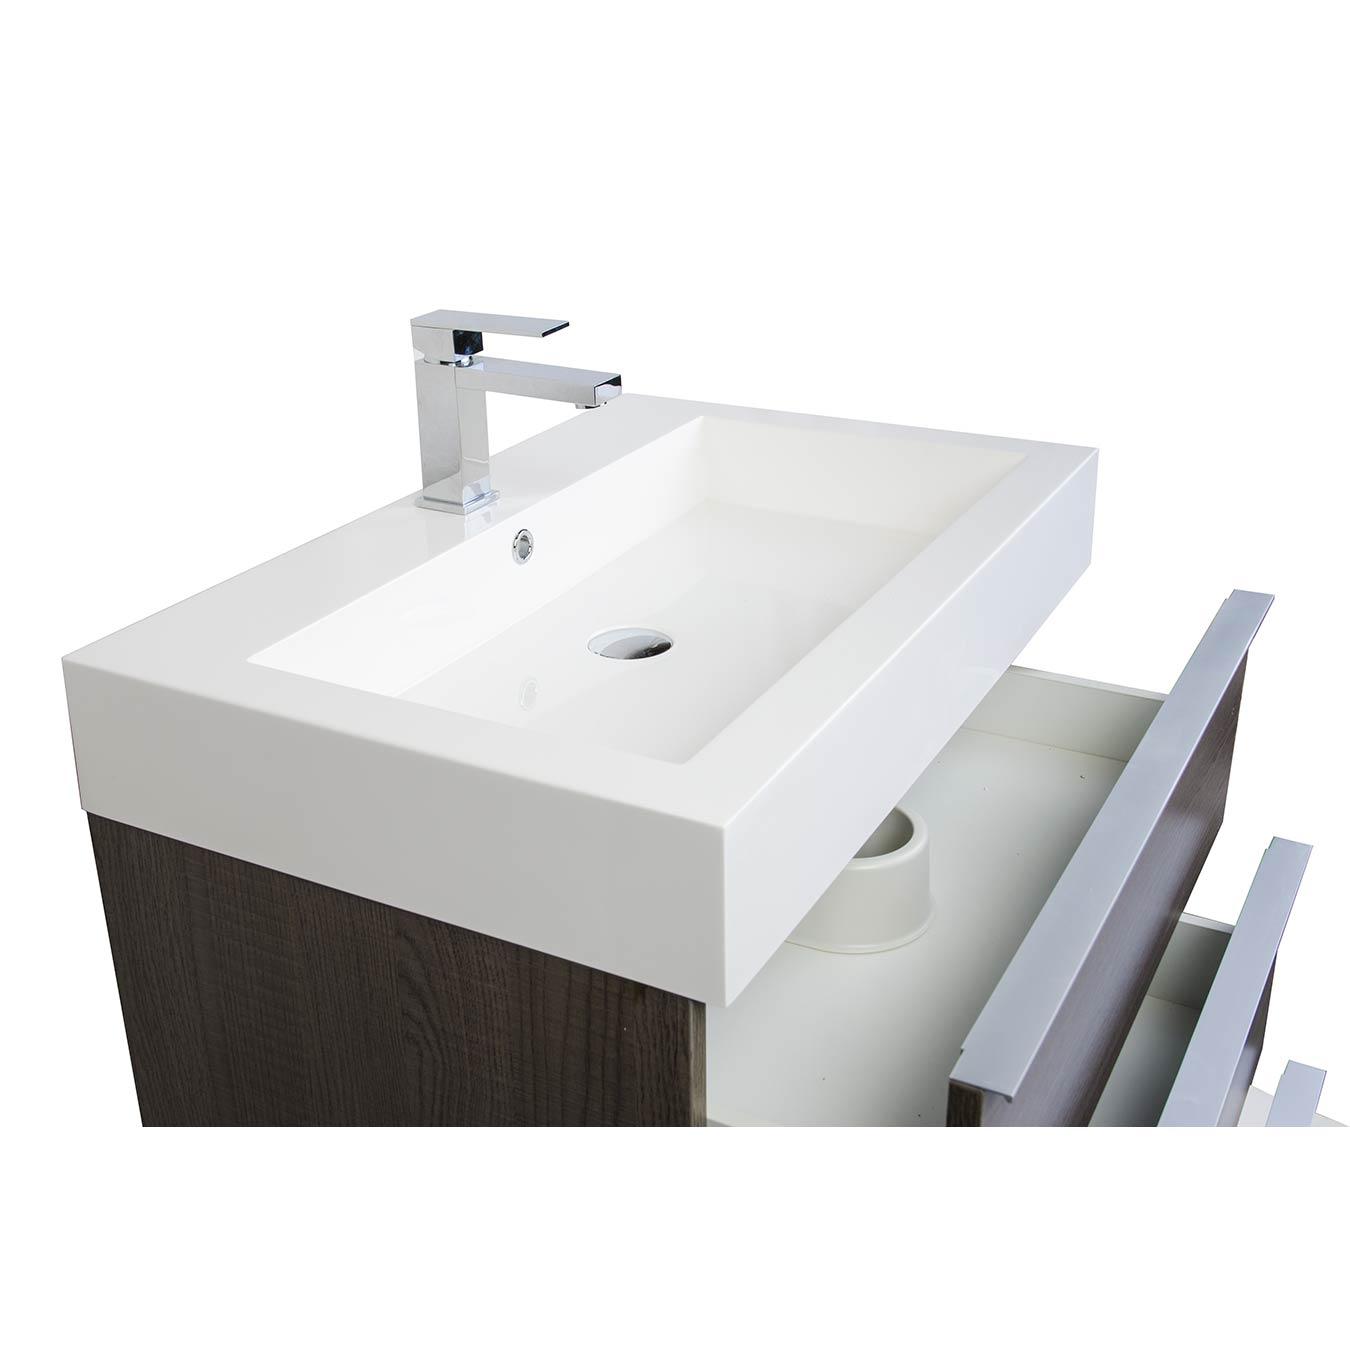 Buy 29 25 Single Bathroom Vanity Set in OAK Optional Mirror RS L750 OAK Con